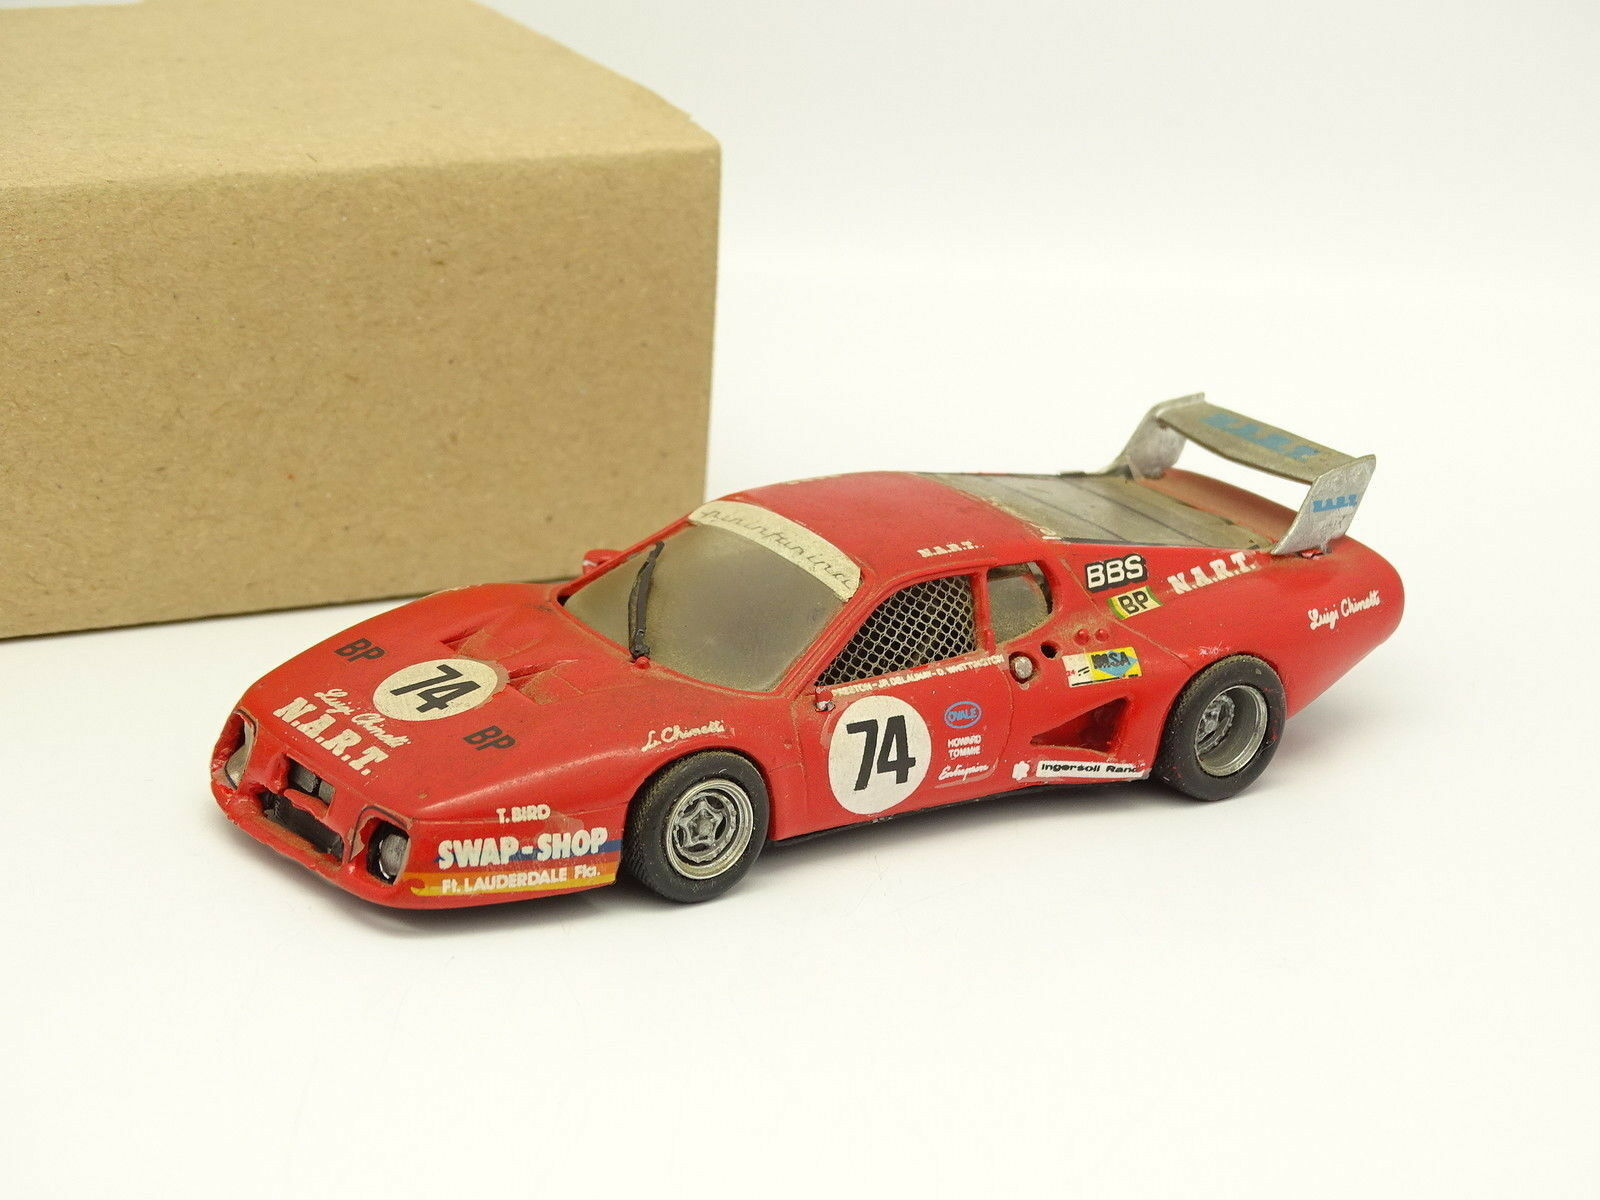 AMR Kit Monté Métal 1 43 - Ferrari 512 BB Le Mans 1980 N°74 NART